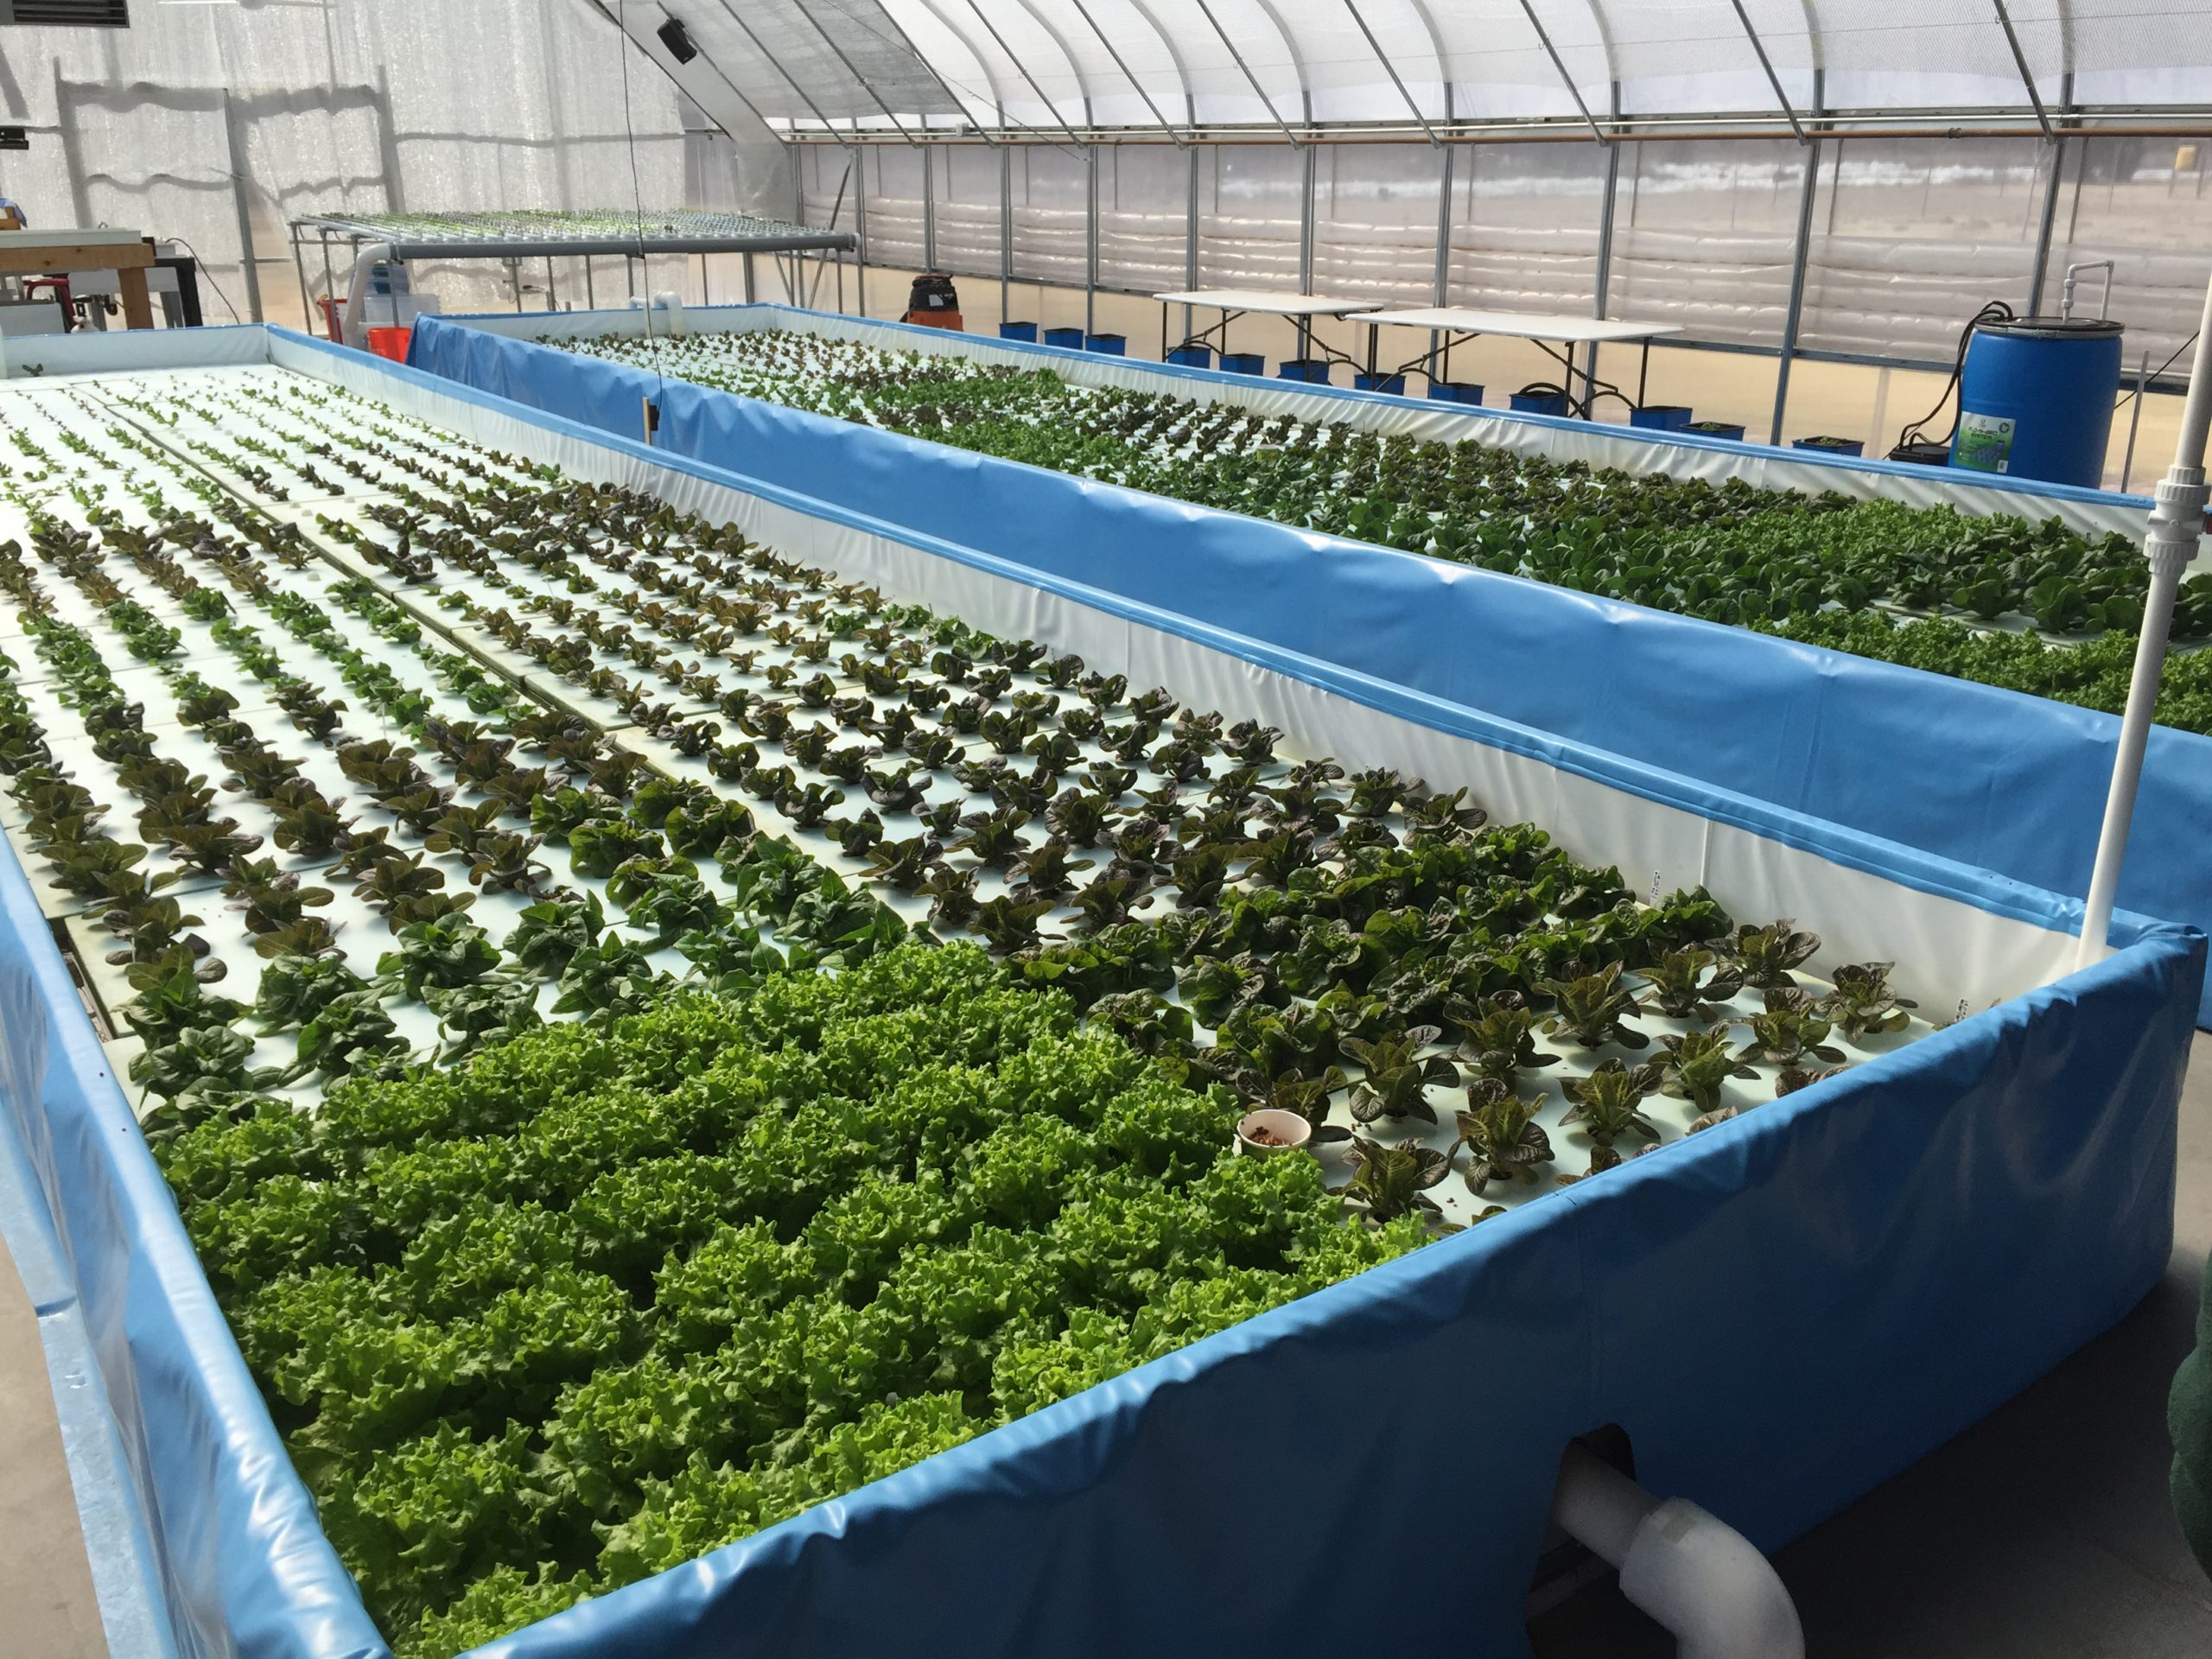 4. Arizona Aquaponic Farm Plans Expansion